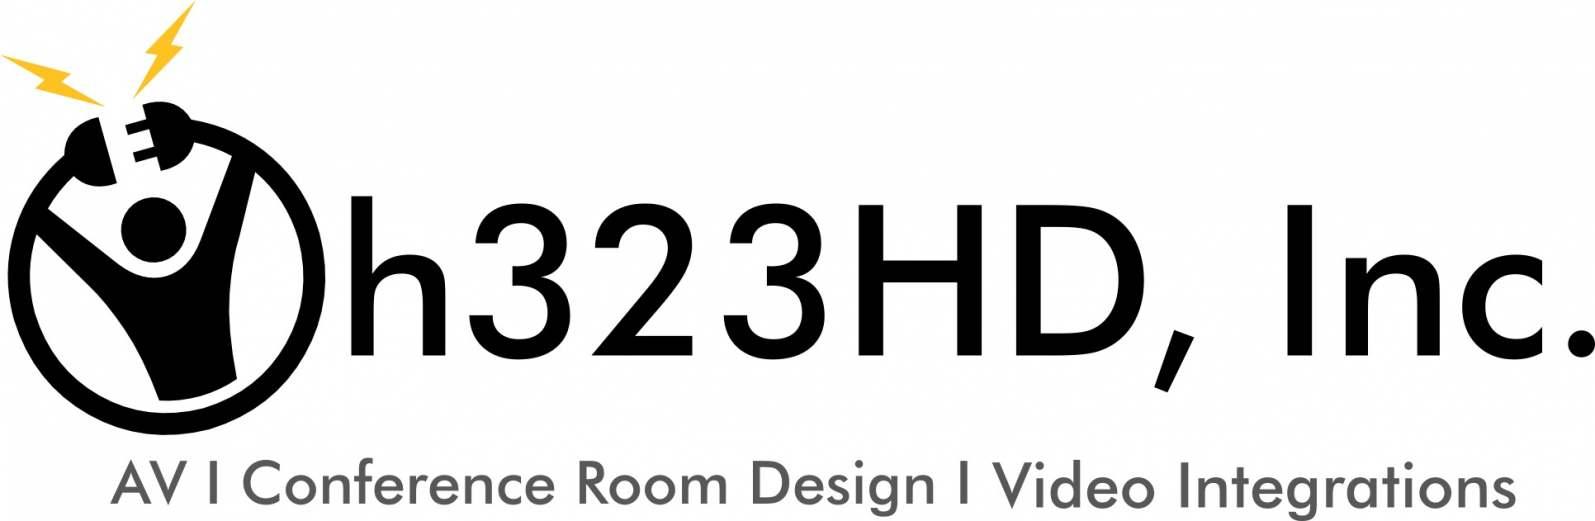 h323HD, Inc. Logo